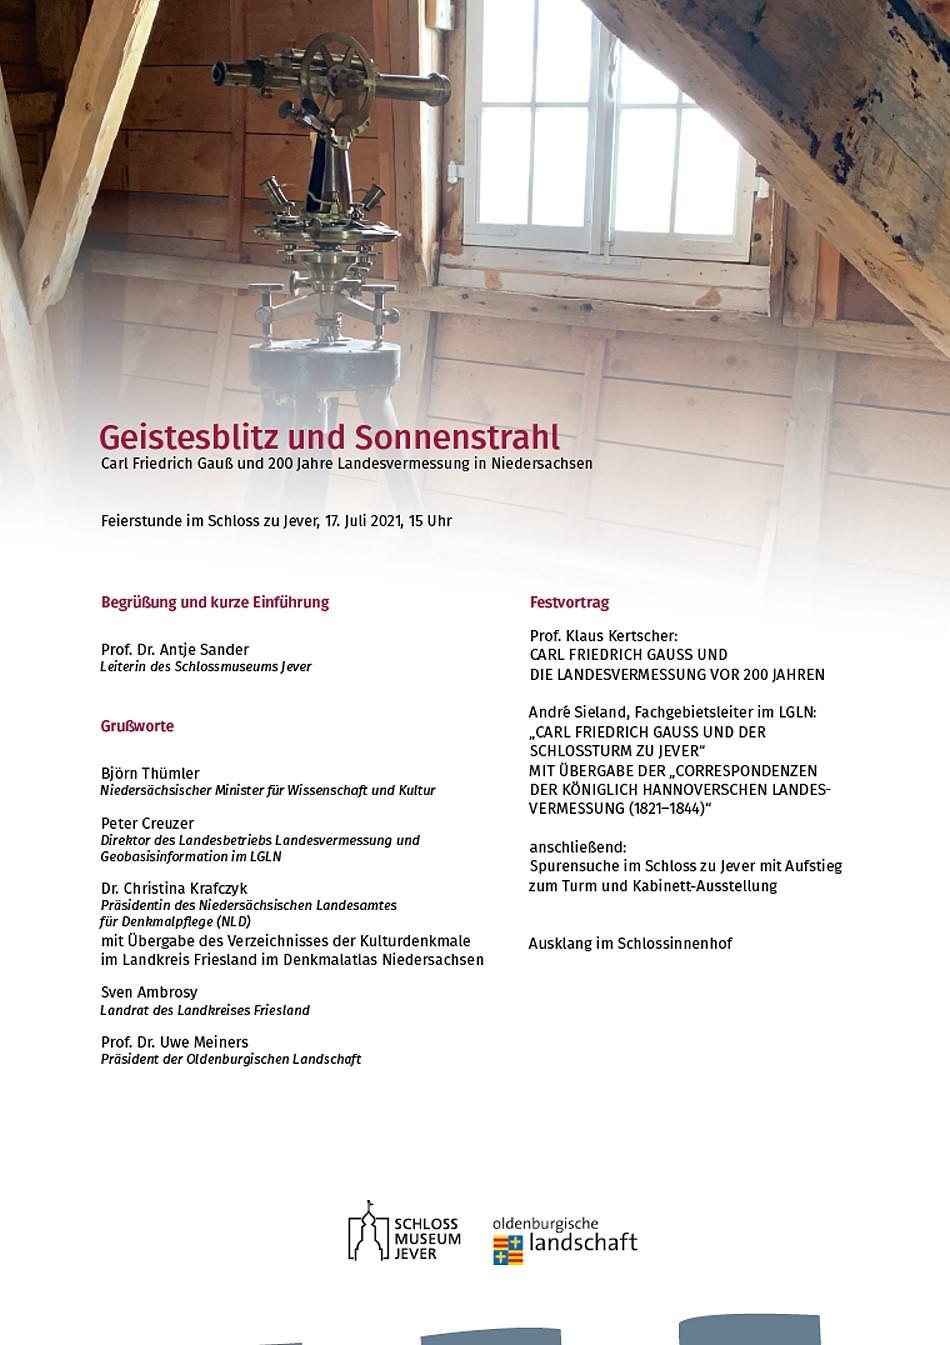 Feierstunde Carl Friedrich Gauß - 200 Jahre Landesvermessung im Schloss am Sa. 17.07.2021